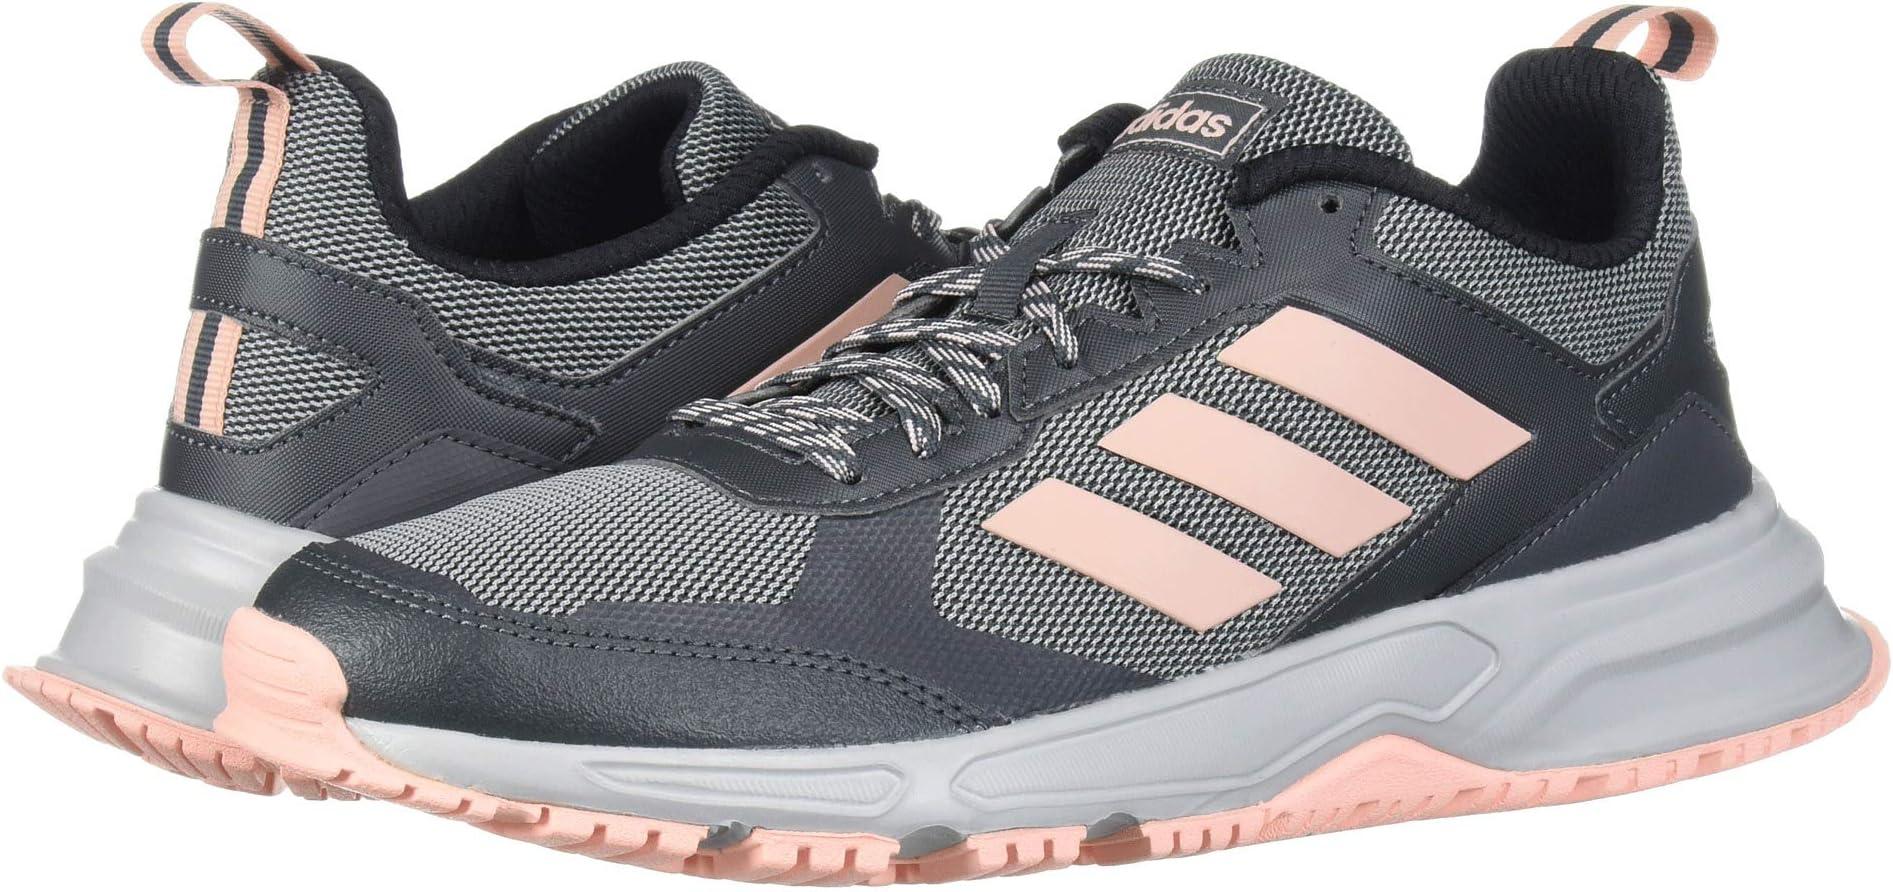 adidas Running Rockadia Trail 3.0